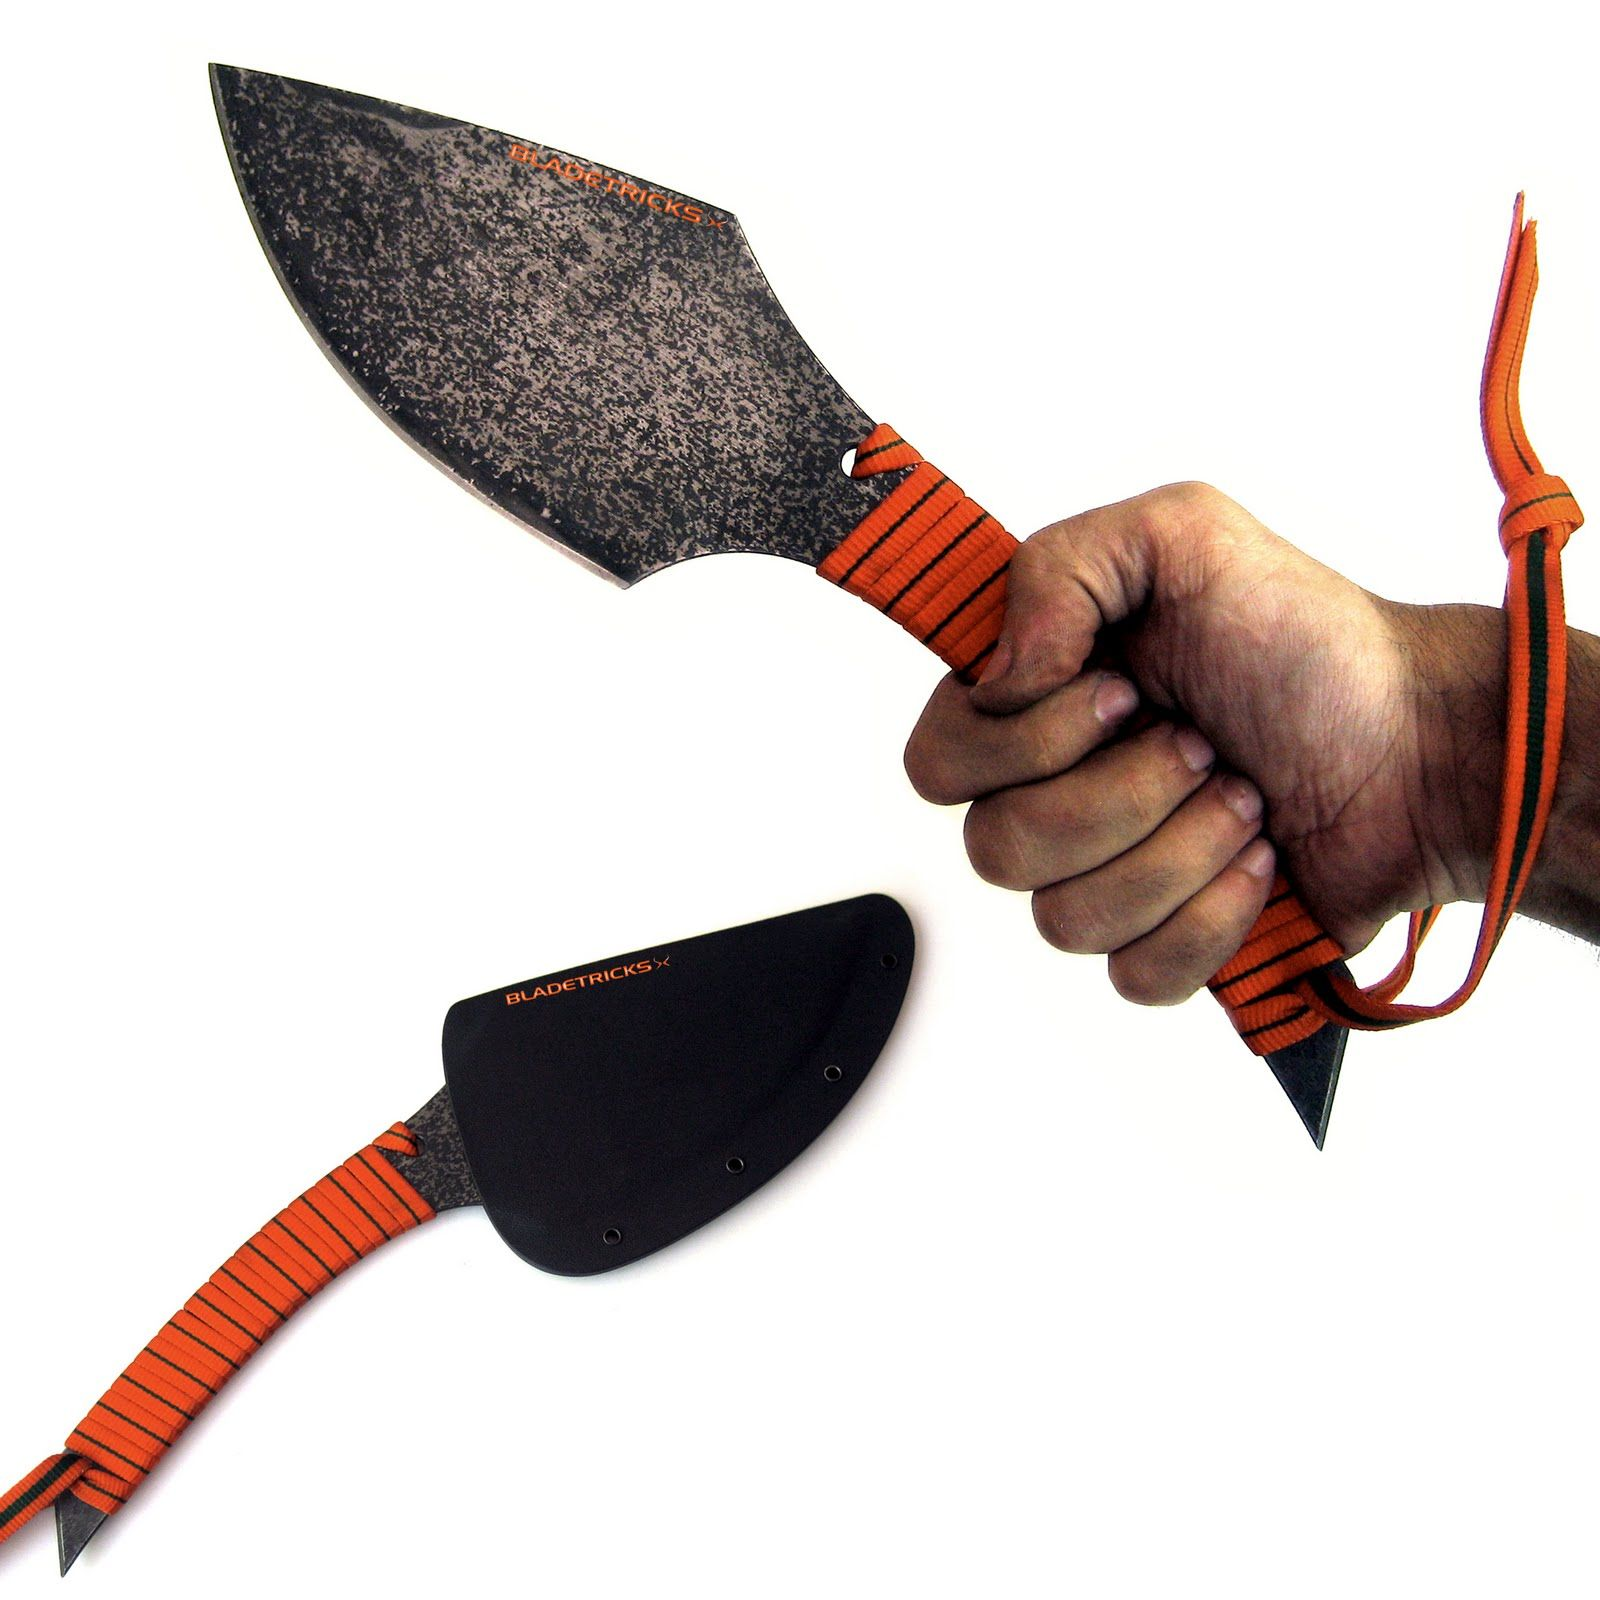 BLADETRICKS: BIG KNIVES